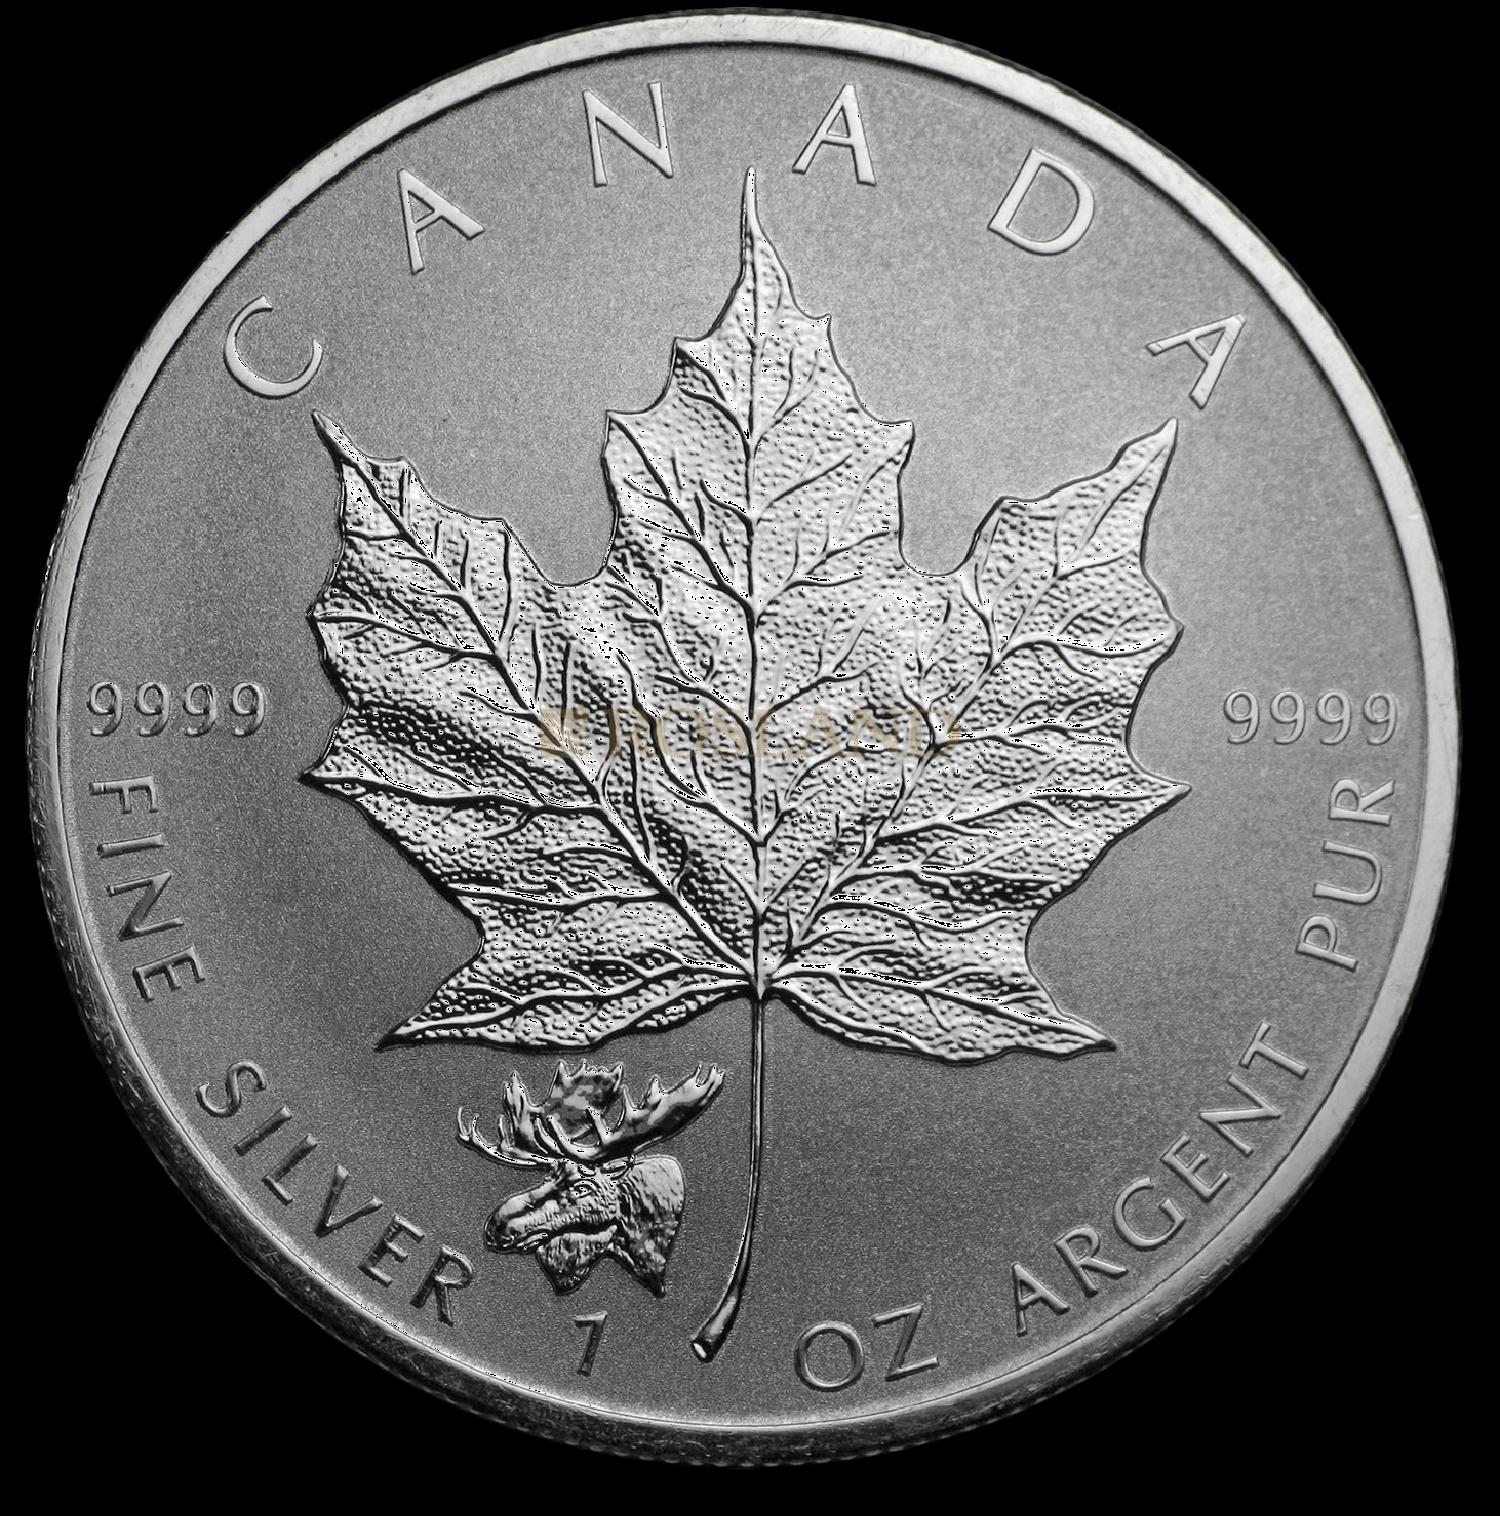 1 Unze Silbermünze Kanada Maple Leaf Elch 2017 PP (Reverse Proof)